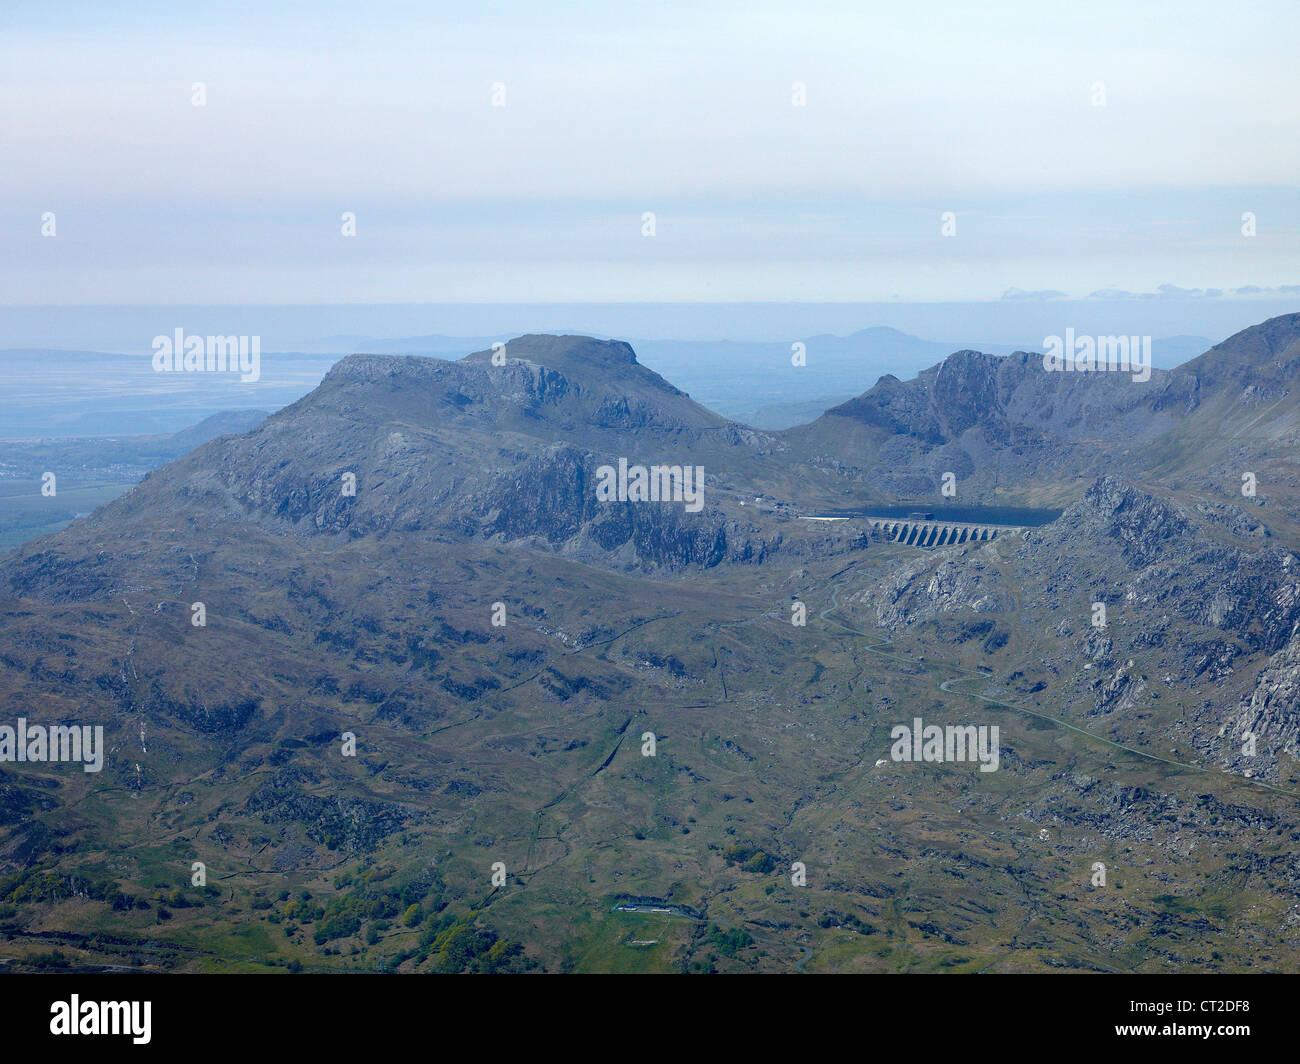 Mountain Top resevoir, Blaenau Festiniog, North Wales, UK - Stock Image